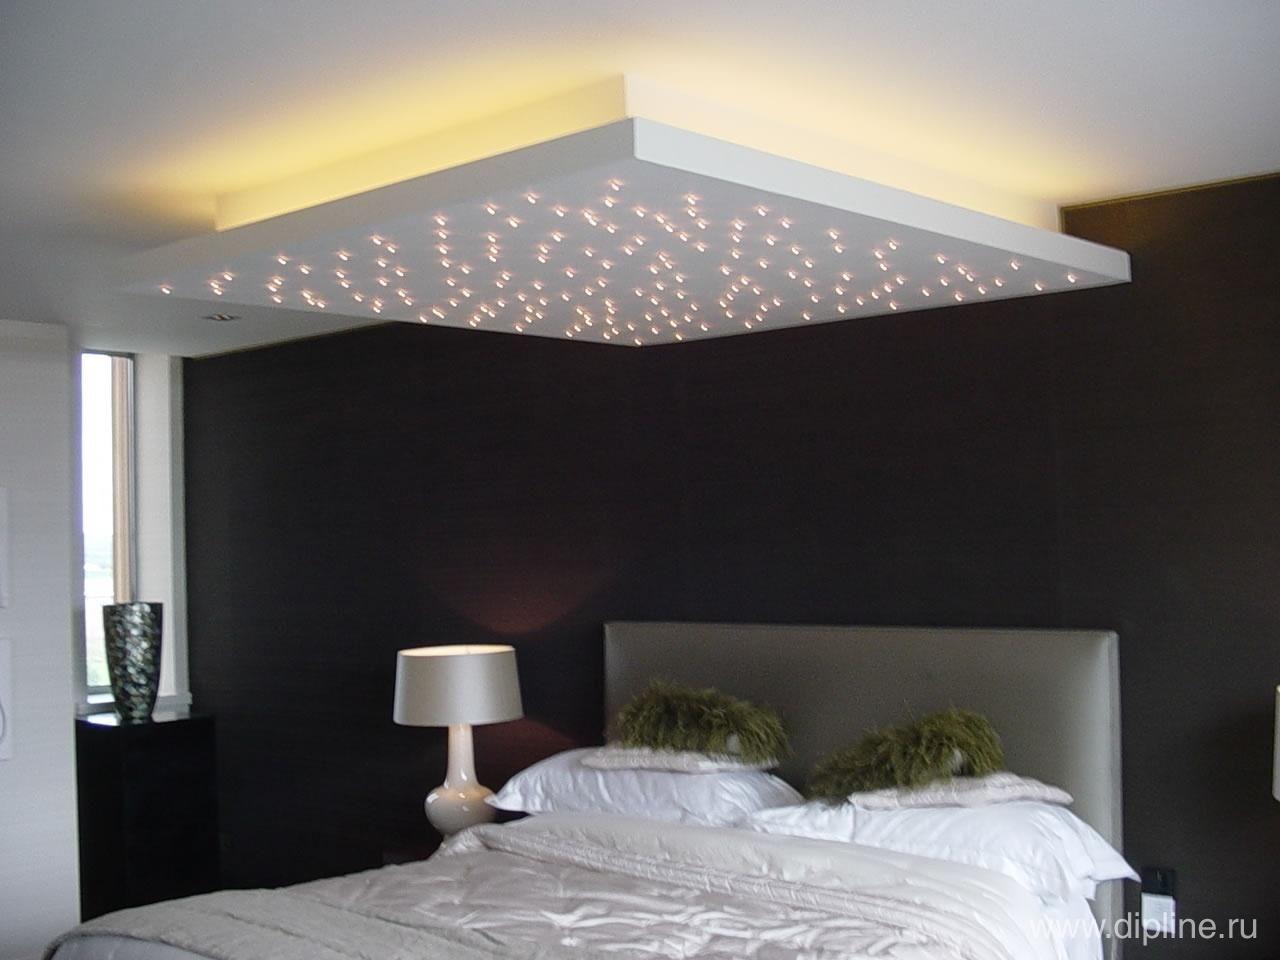 plafond r tro clair avec effet toil wow. Black Bedroom Furniture Sets. Home Design Ideas